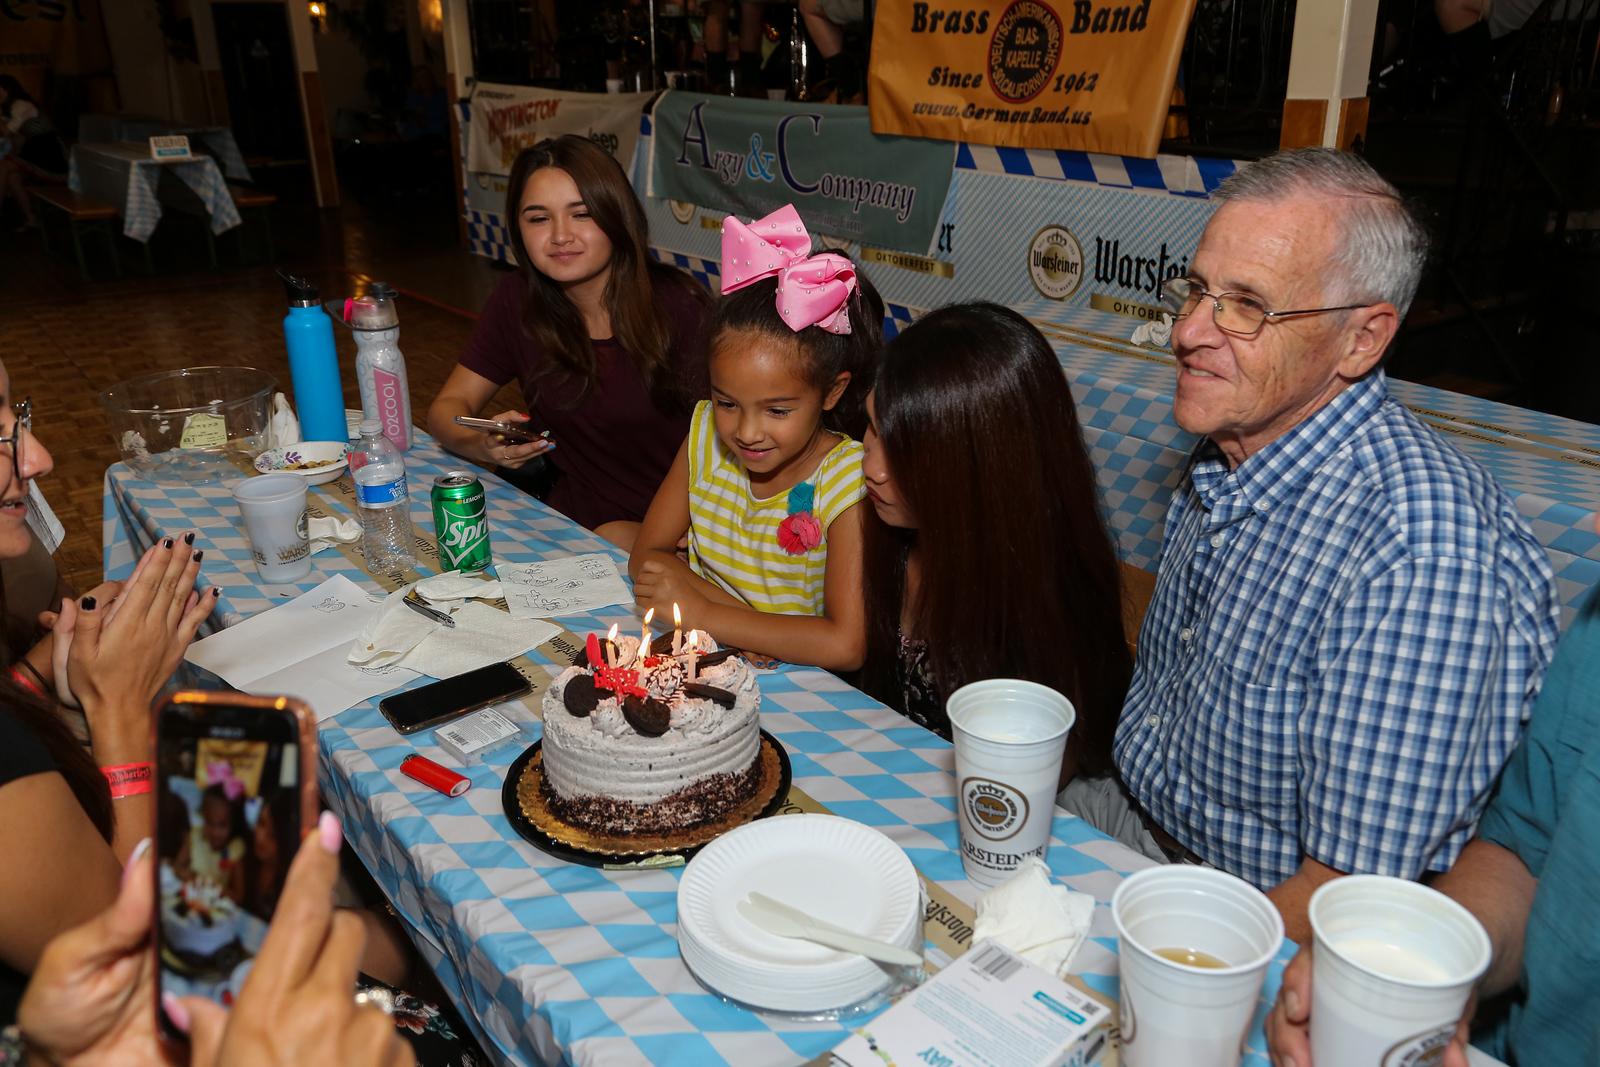 Oktoberfest is Kinderfest Family Day